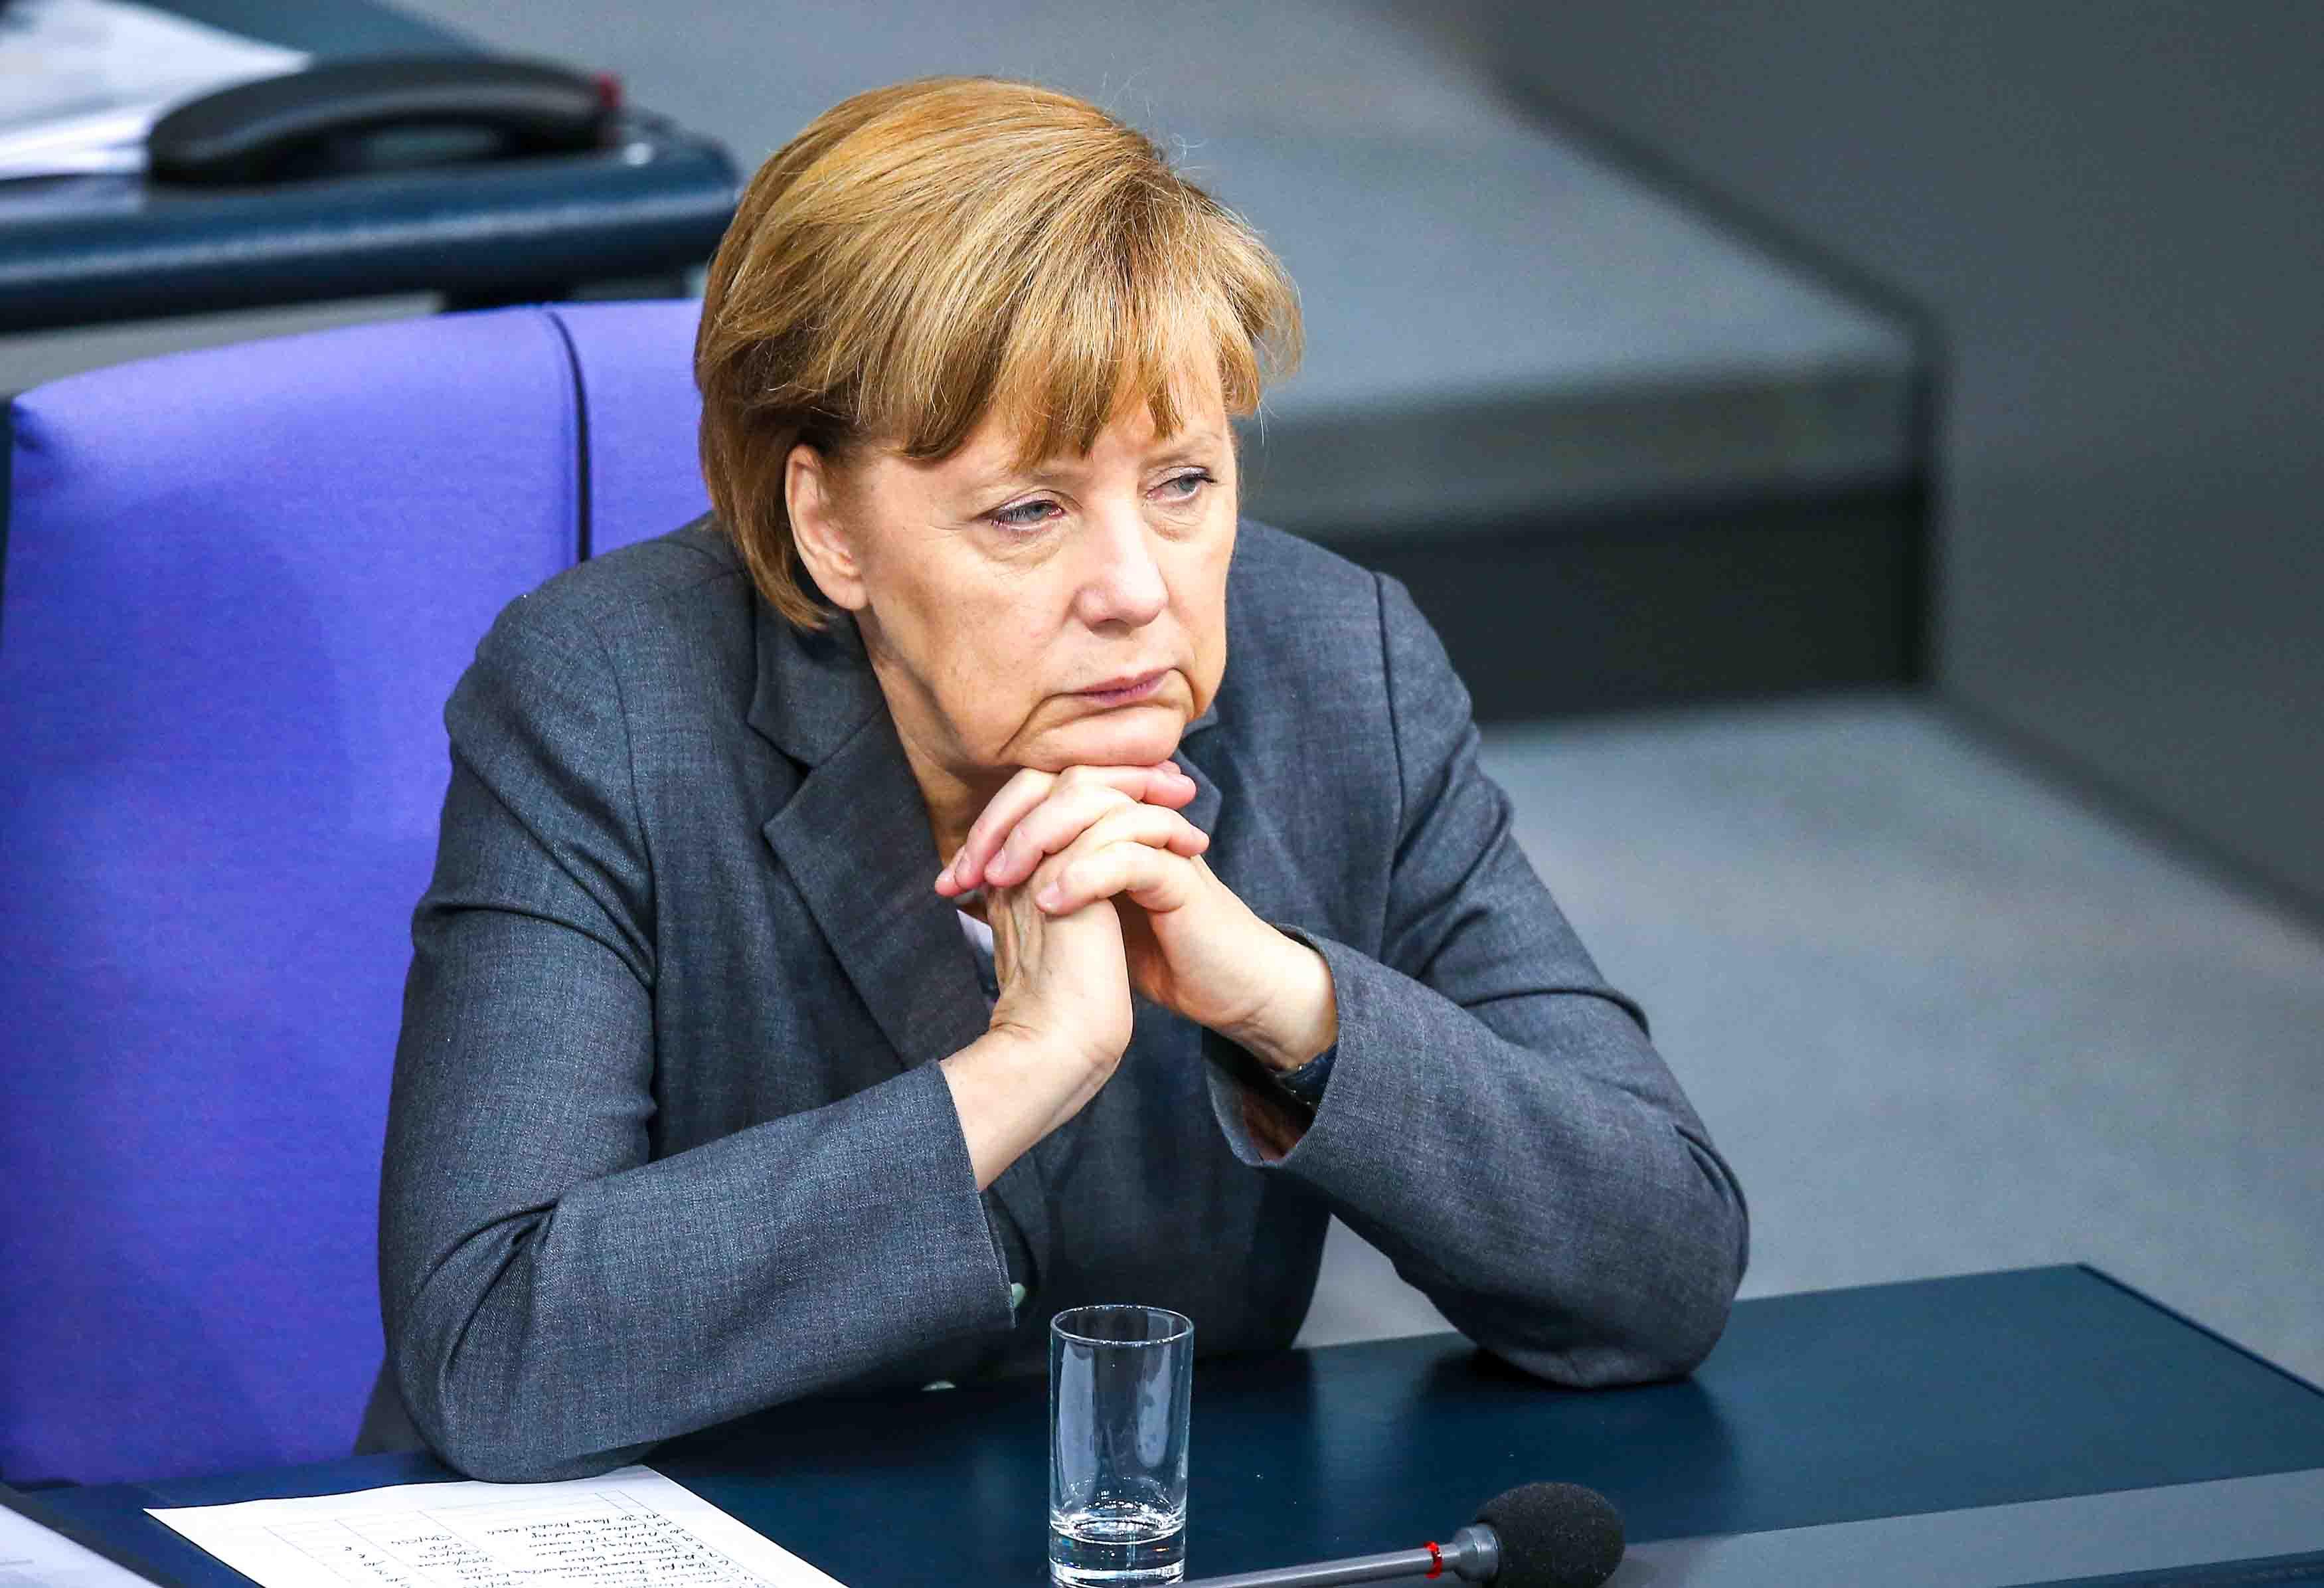 Канцлер ФРГ Ангела Меркель. Фото: Sean Gallup/Getty Images